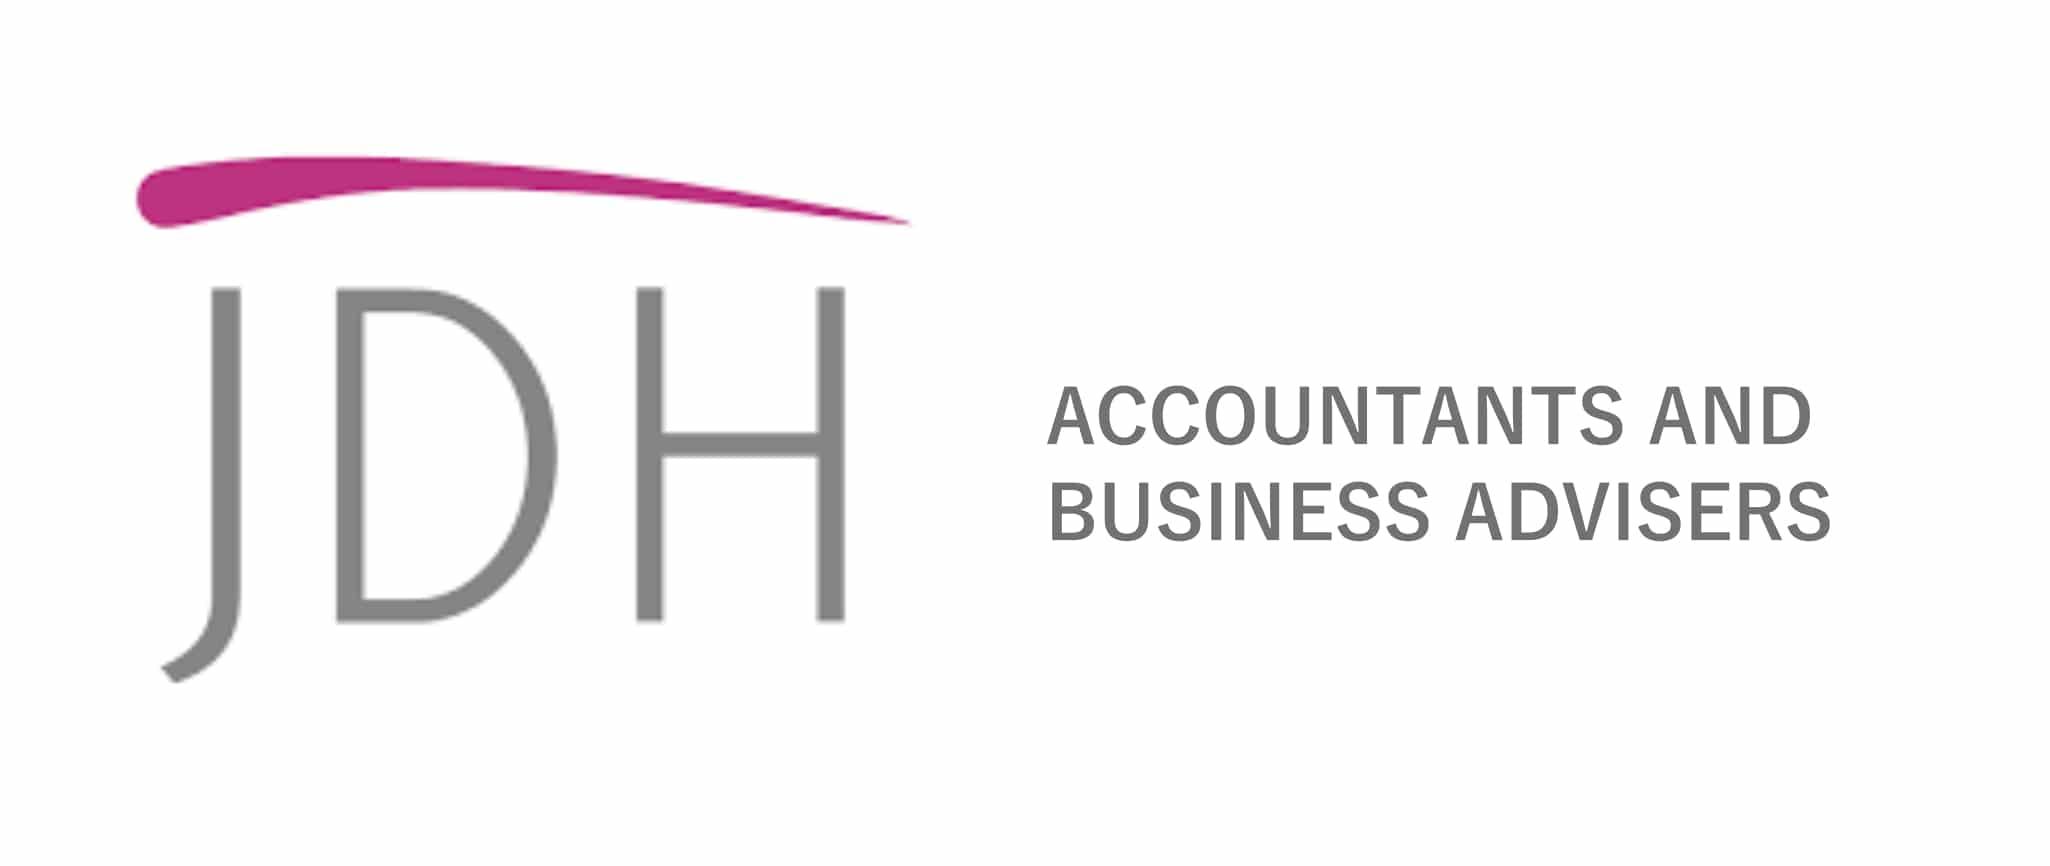 JDH Accountants & Bookkeeping | Abercynon, Pontypridd